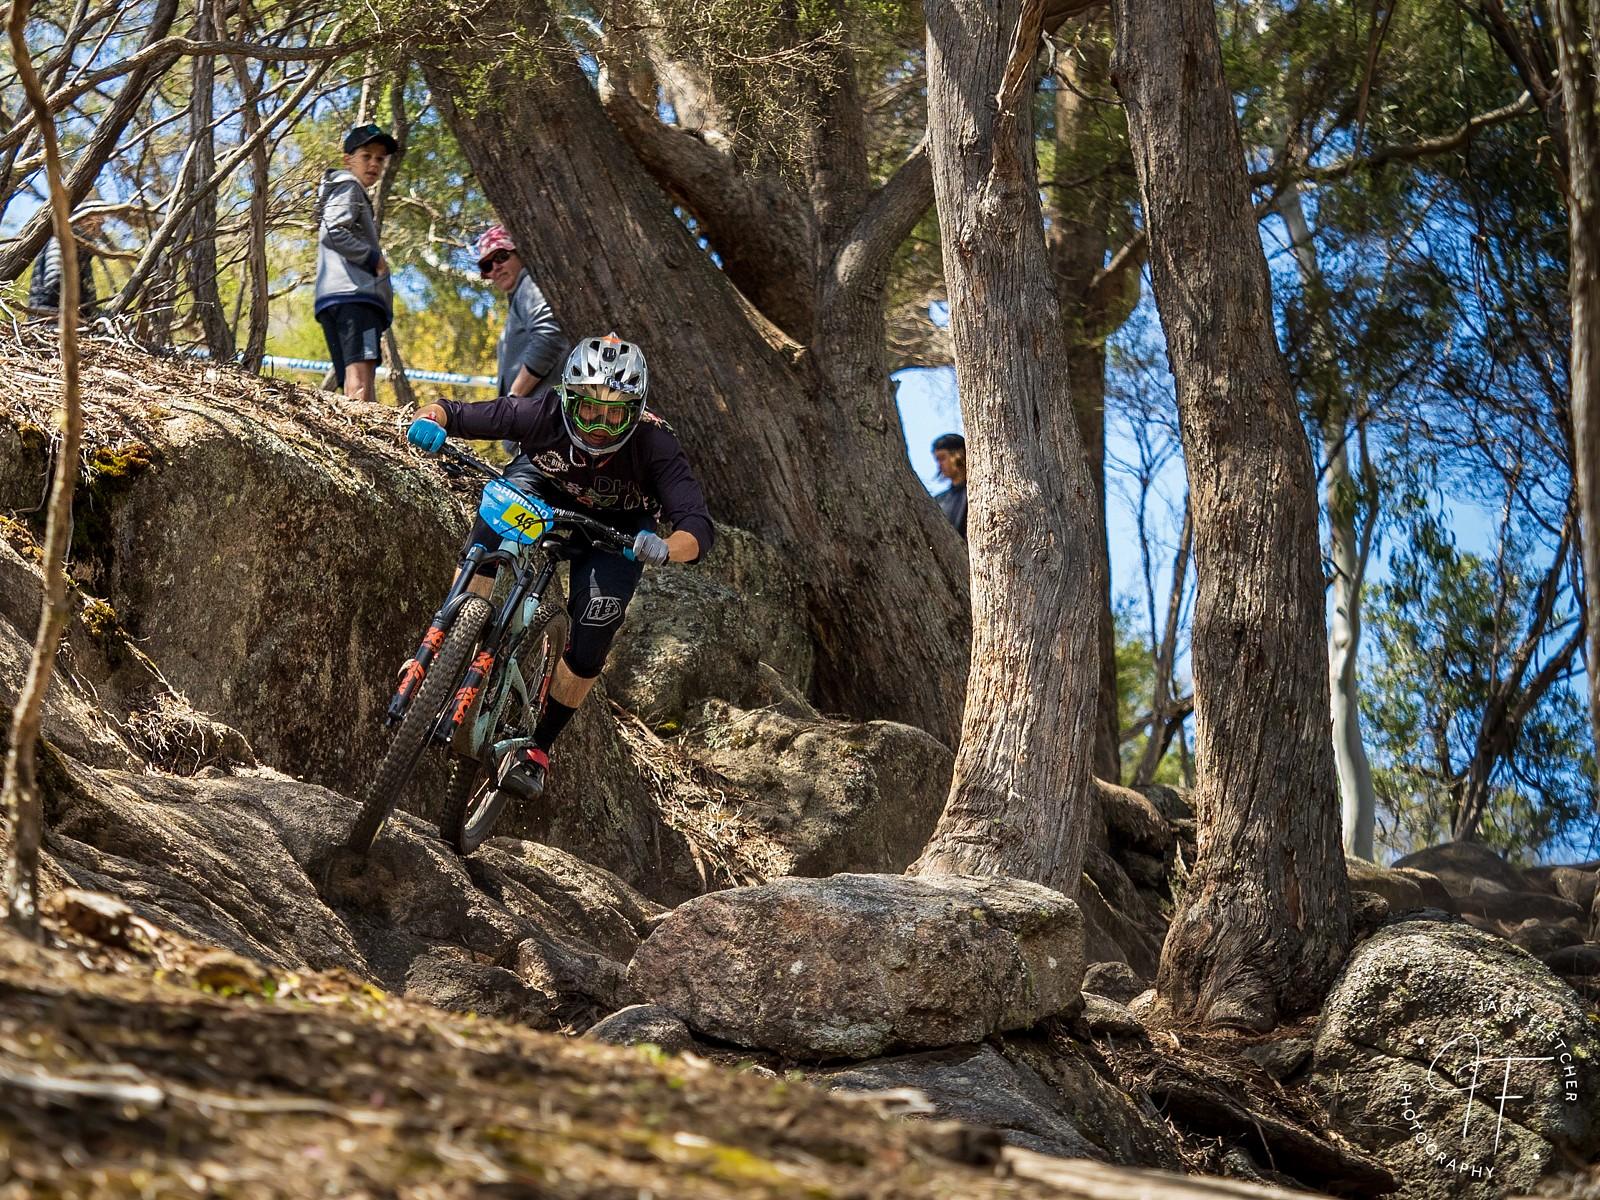 171119-Tassie-1376 - jack.fletcher86 - Mountain Biking Pictures - Vital MTB